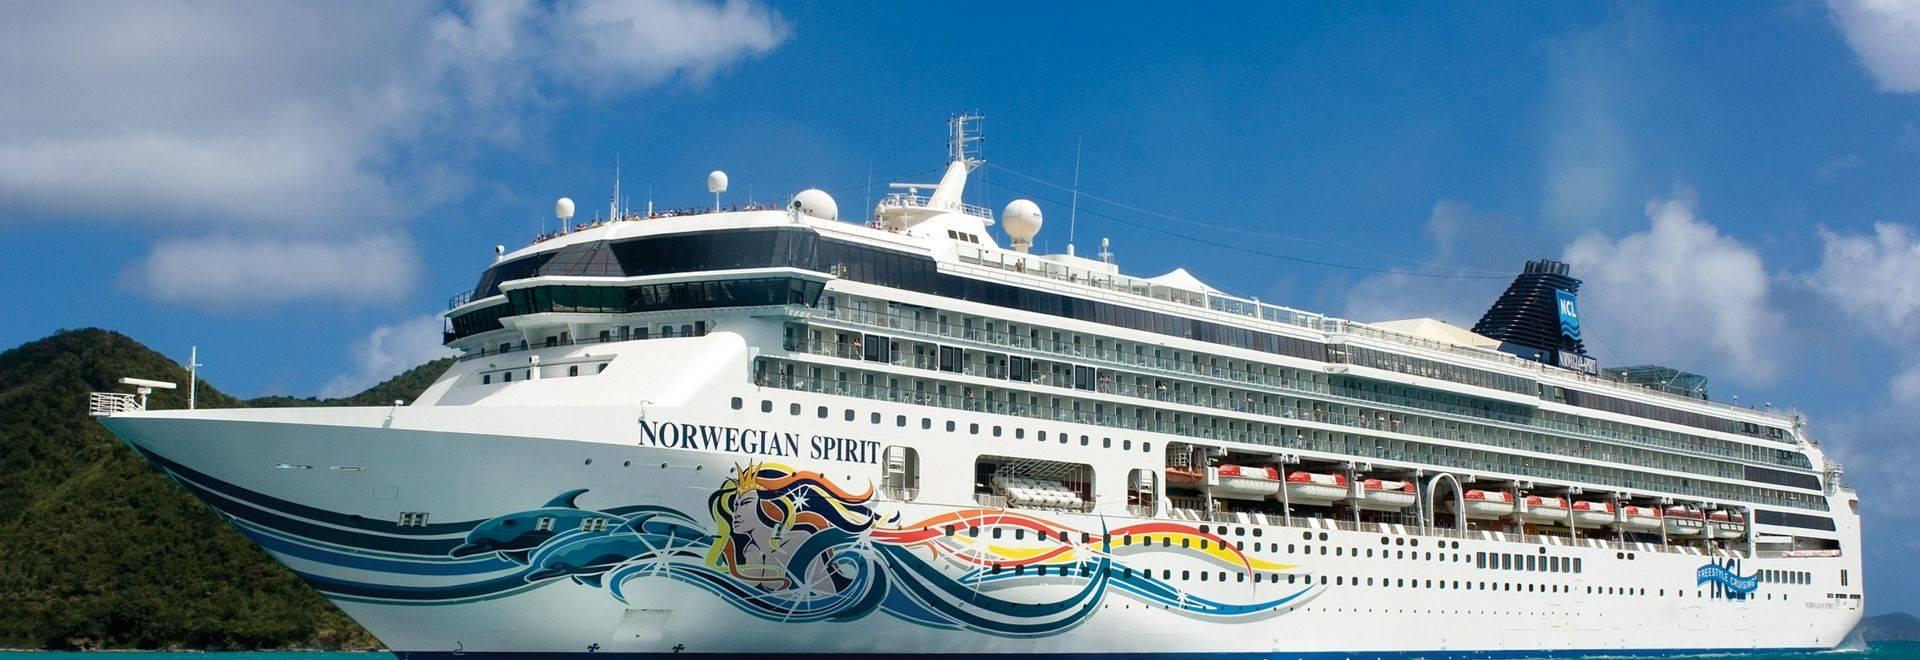 Norwegian Spirit in Tortola - British Virgin IslandsNorwegian Spirit - Norwegian Cruise Line